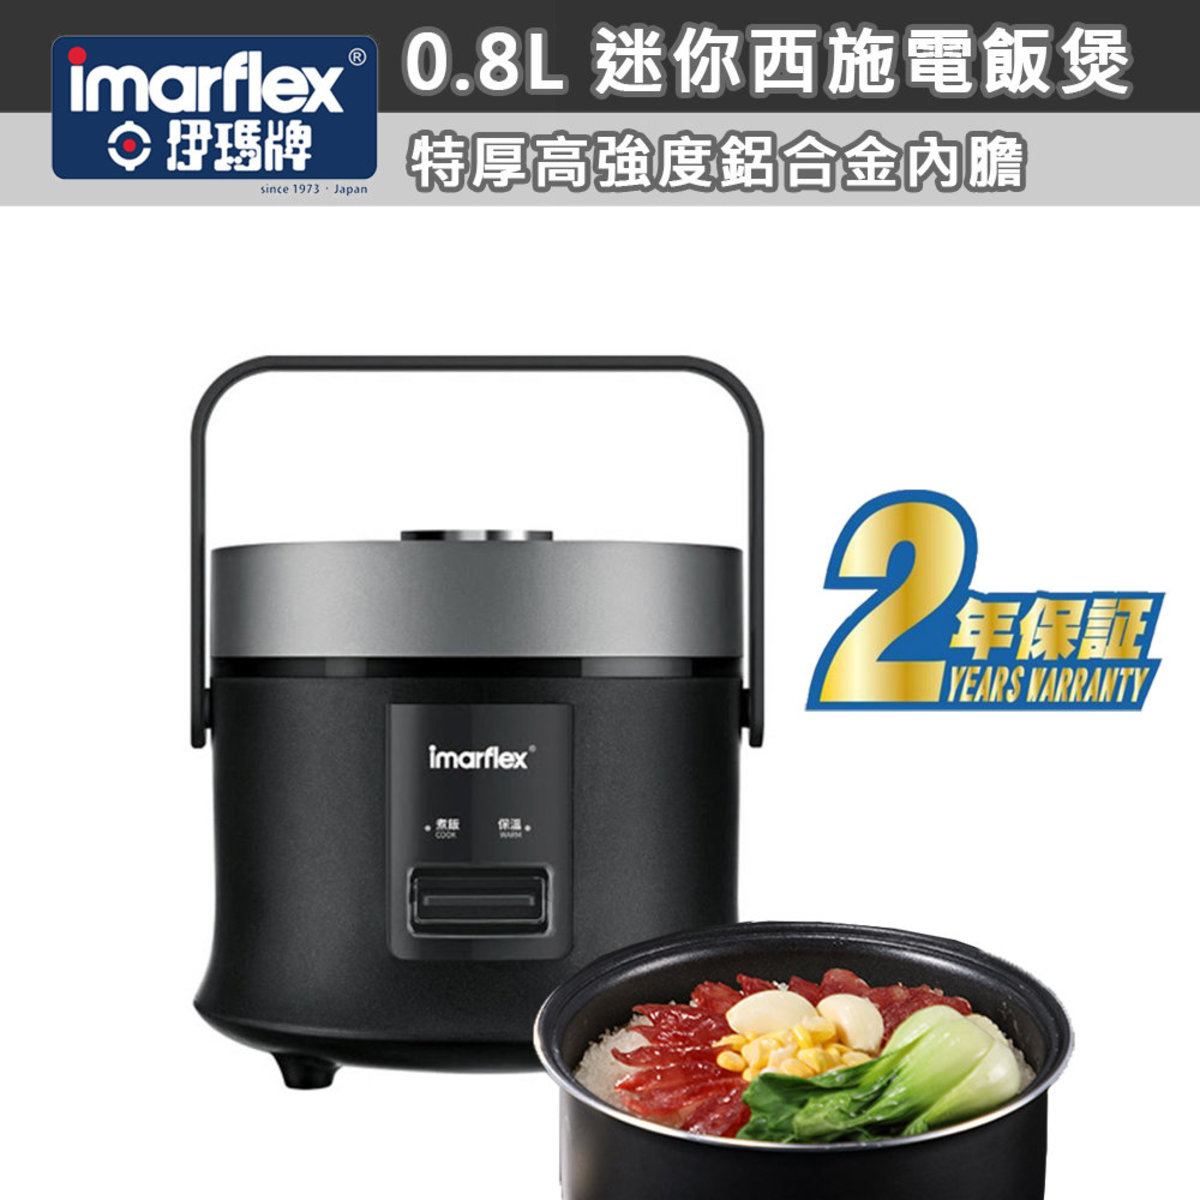 0.8L Rice Cooker - IRC-YH16BK